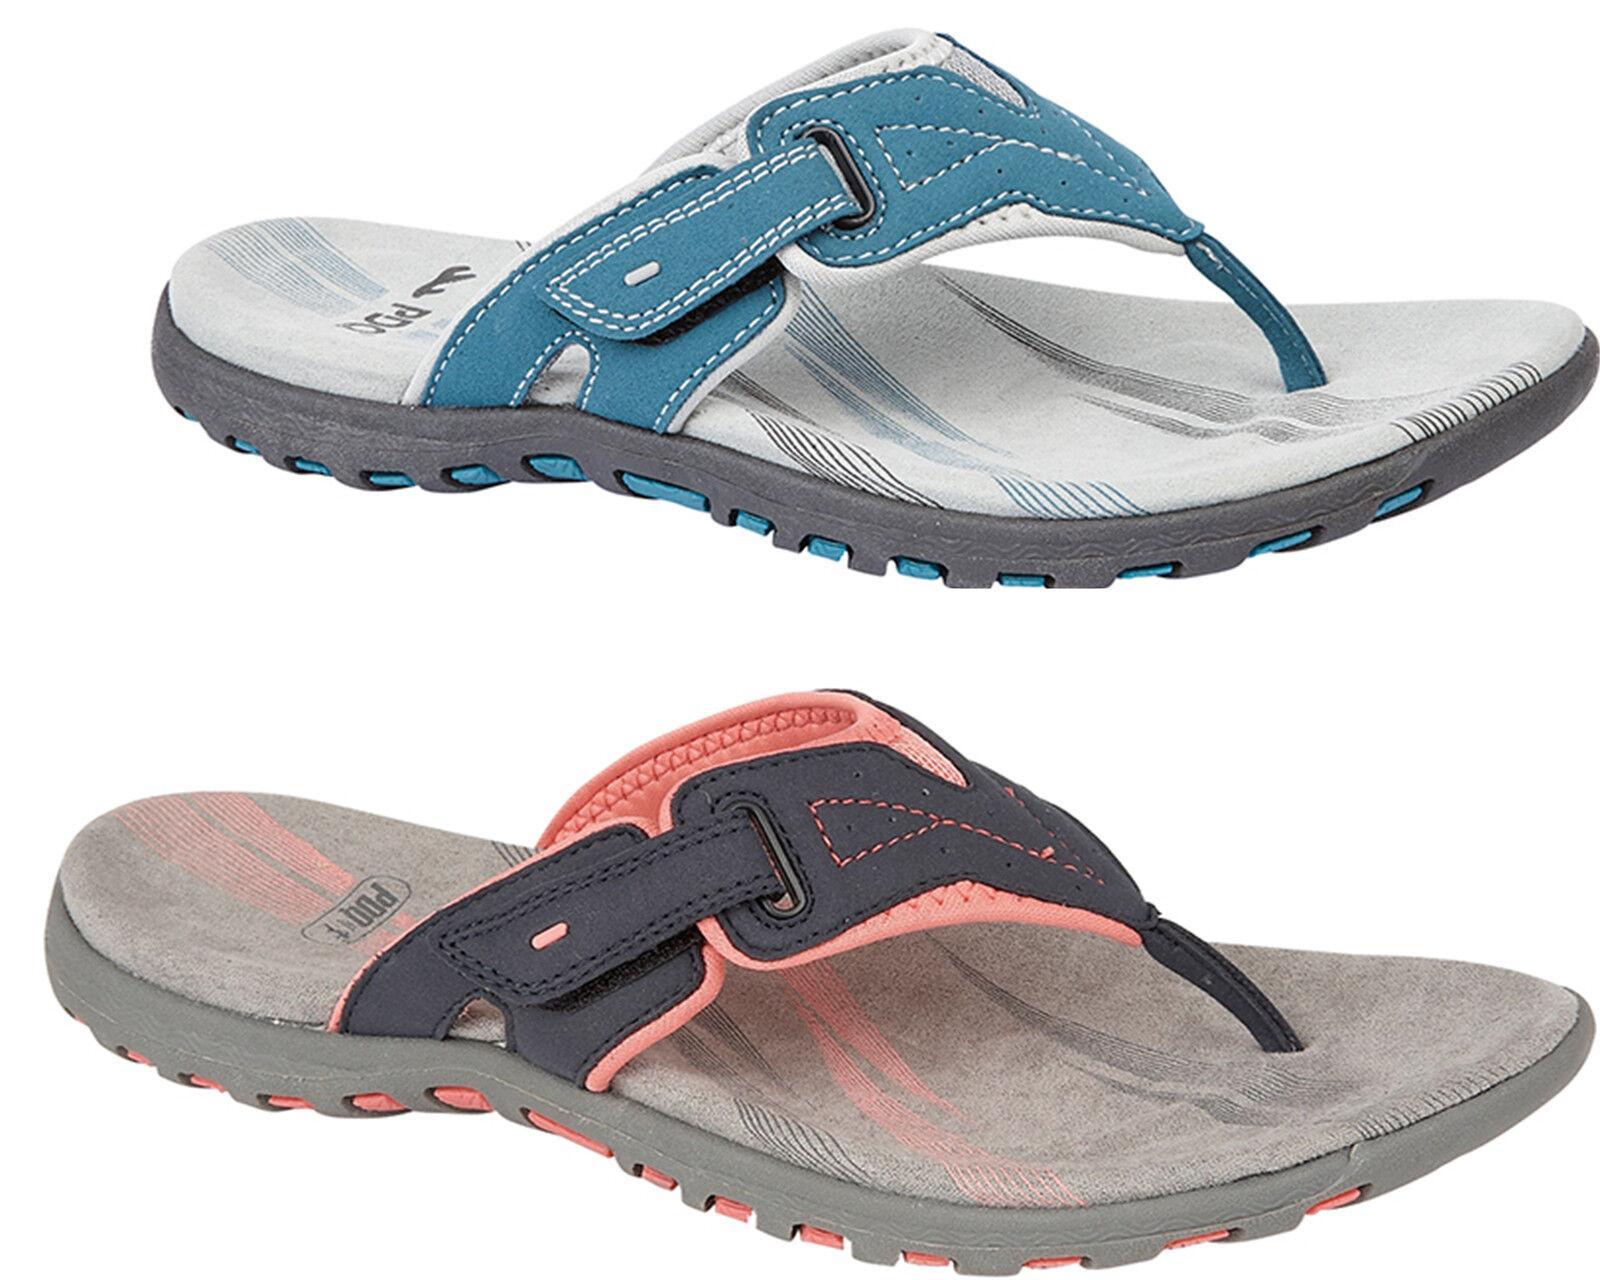 Womens Casual Sandals Summer Toe Post Flexi Sole Slip On Sandal Mules